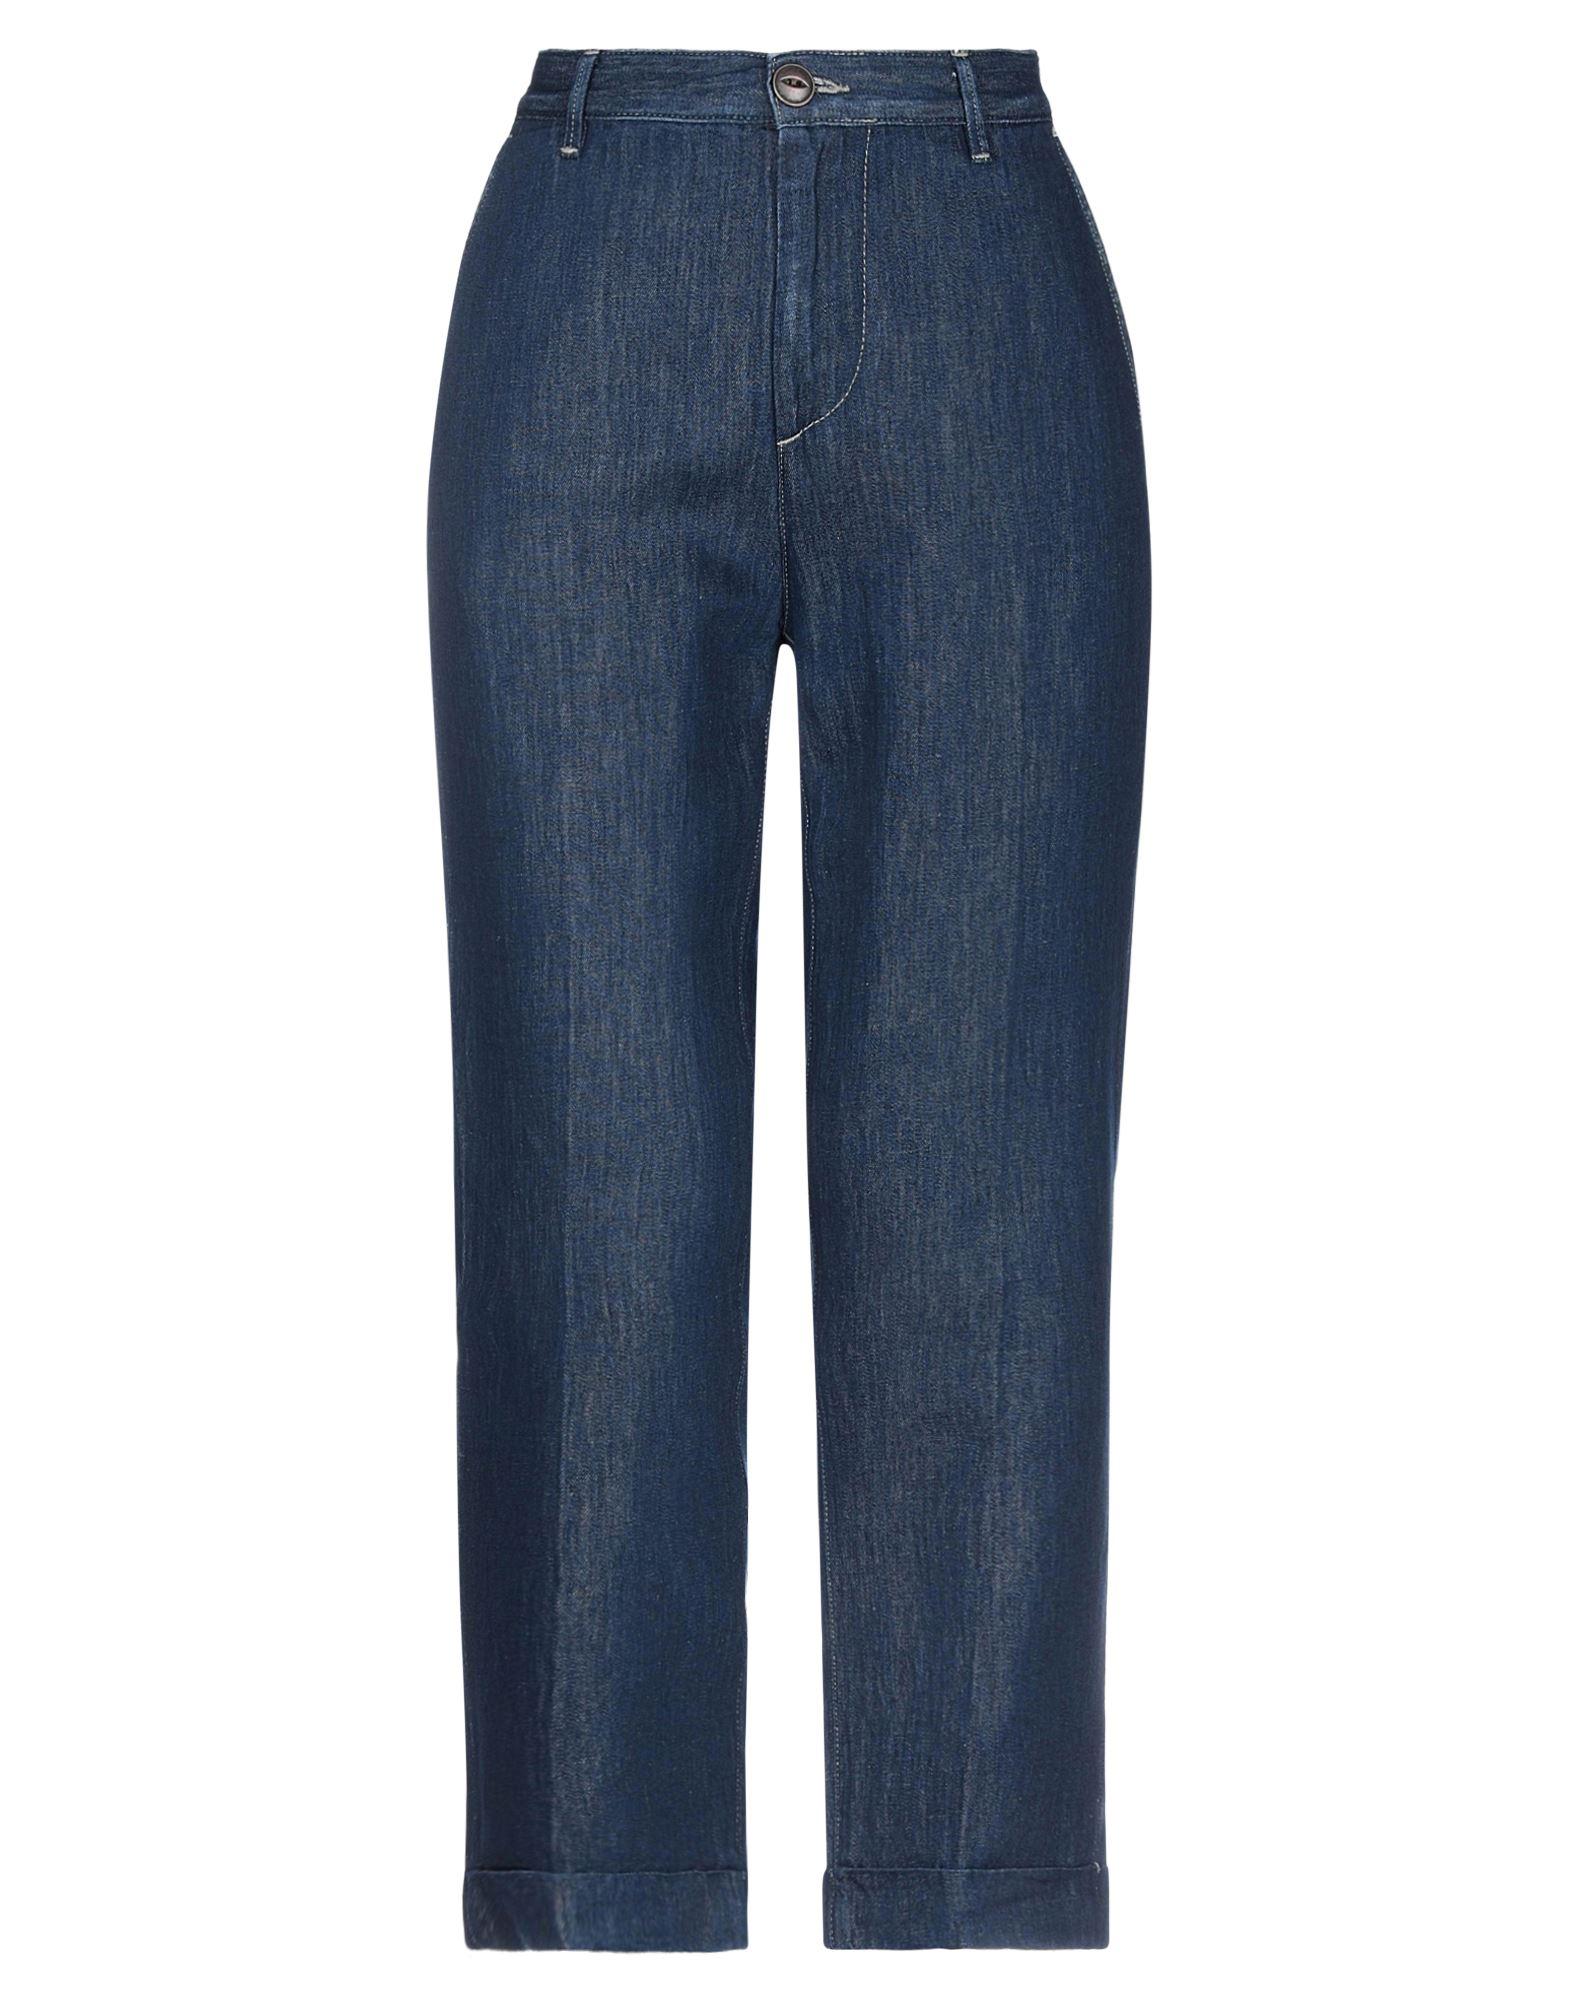 CARE LABEL Джинсовые брюки care label футболка